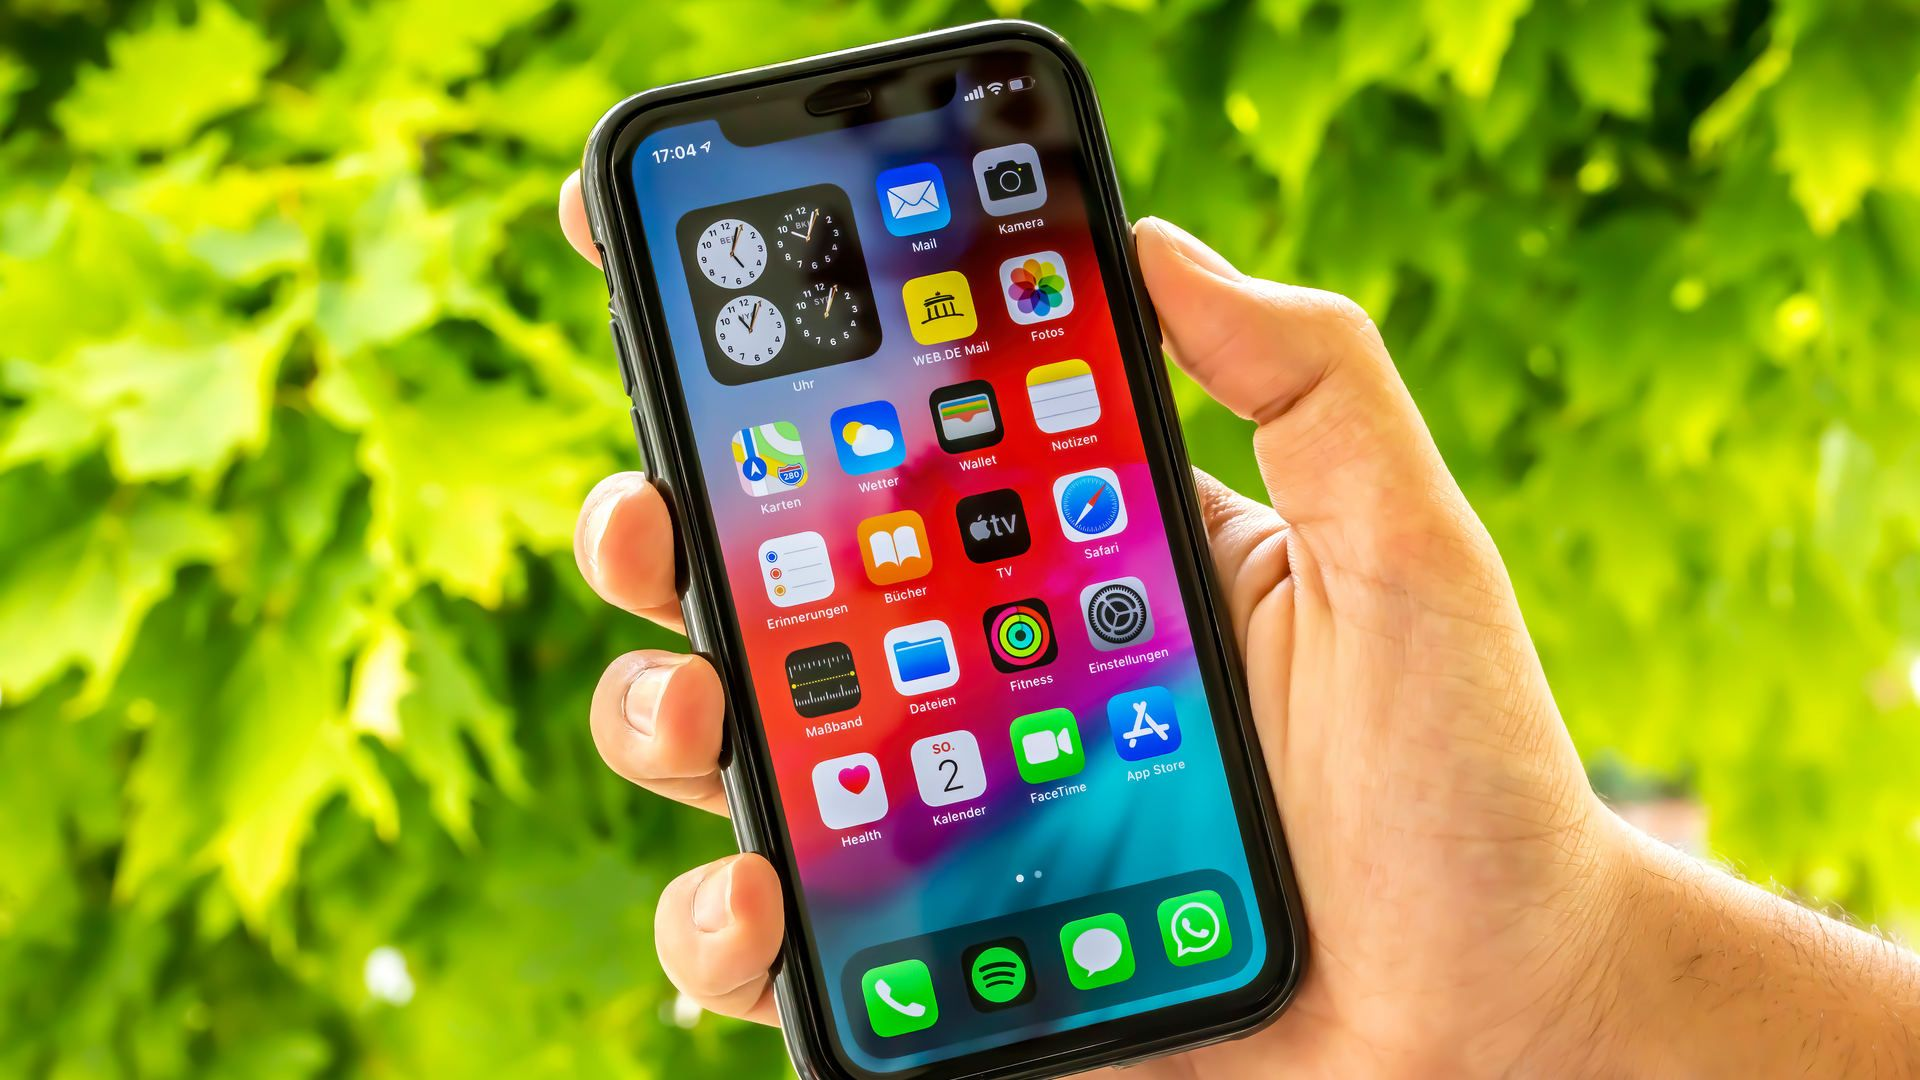 O iPhone 11 Pro Max tem tela OLED com 6,5 polegadas (Foto: Shutterstock)